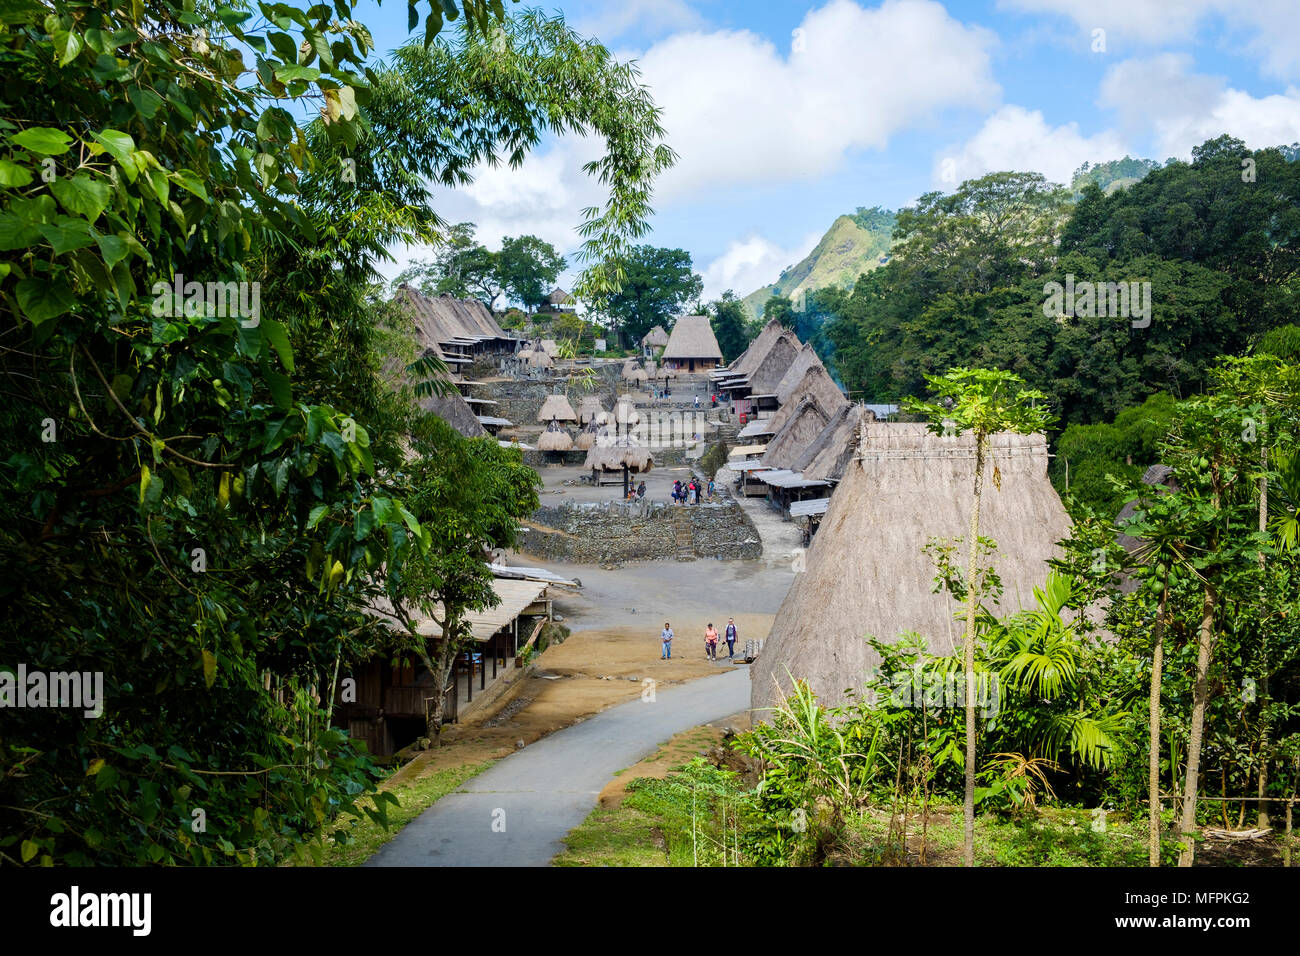 Overview of Bena traditional village, Ngada District, Flores Island (East Nusa Tenggara), Indonesia. - Stock Image